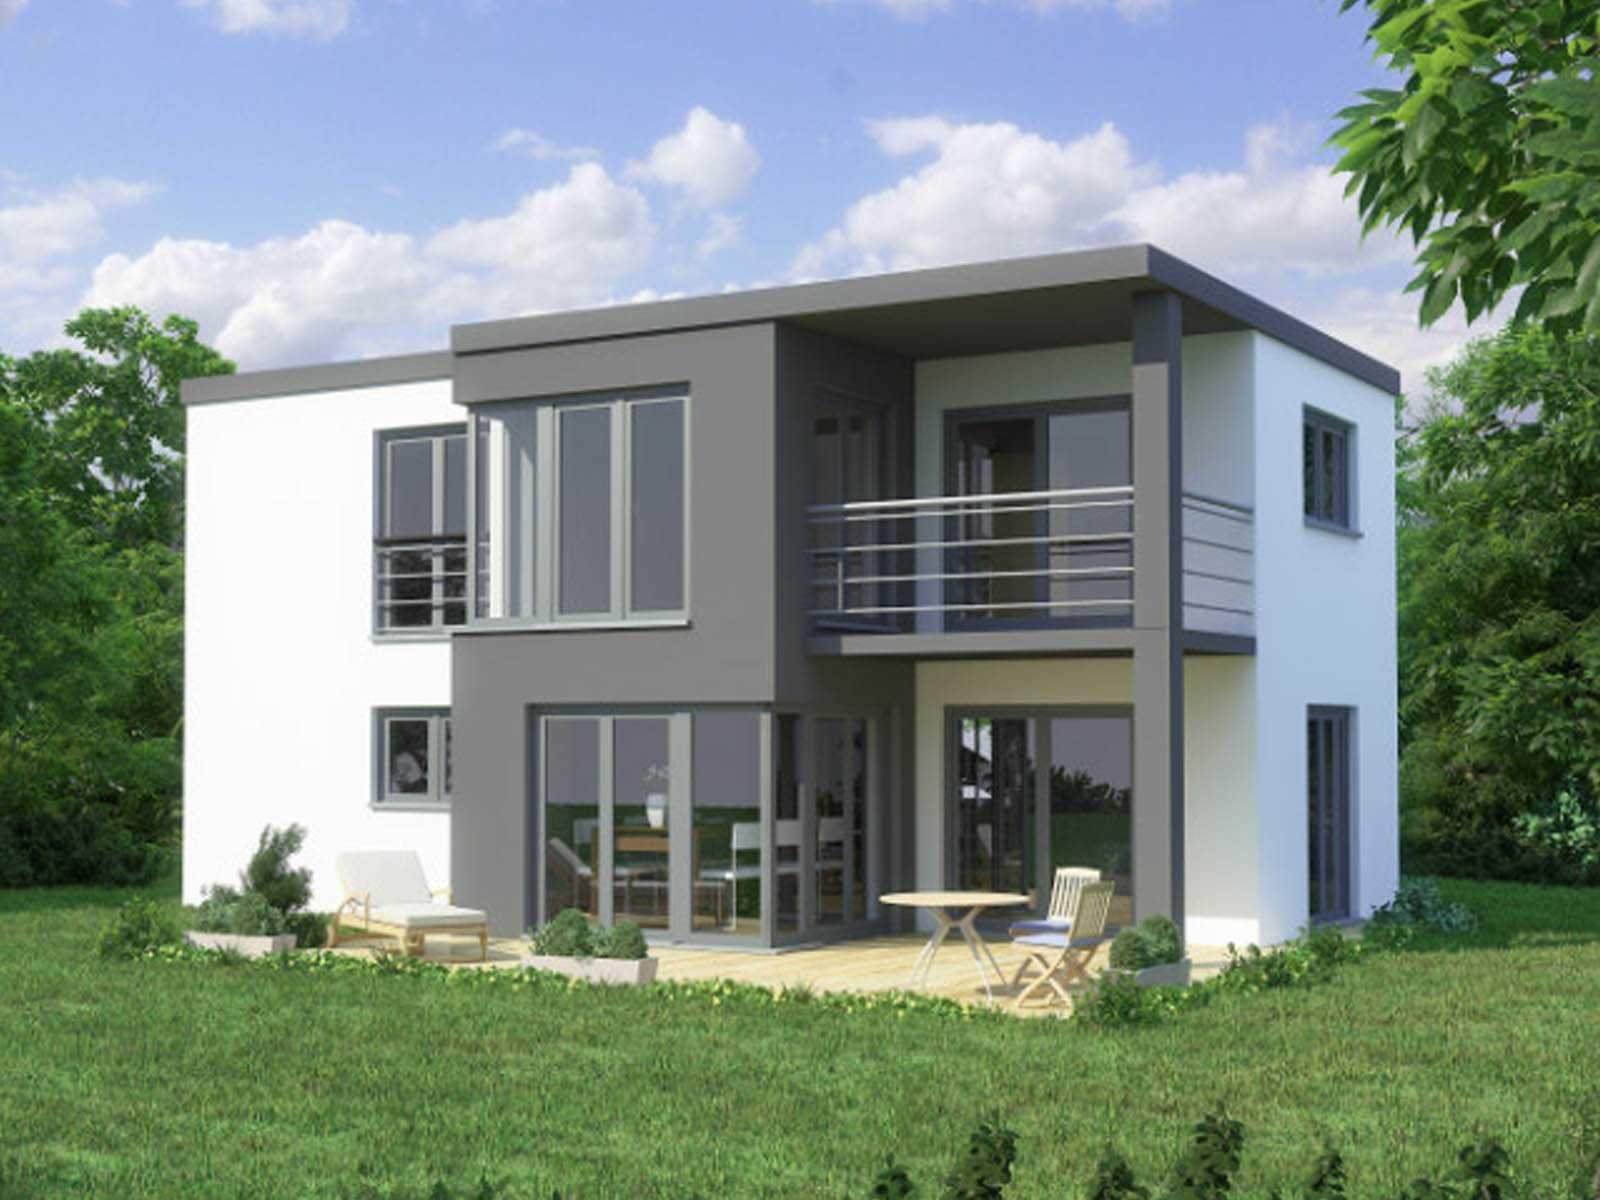 Conceptdesign favorit massivhaus for Massivhaus modern